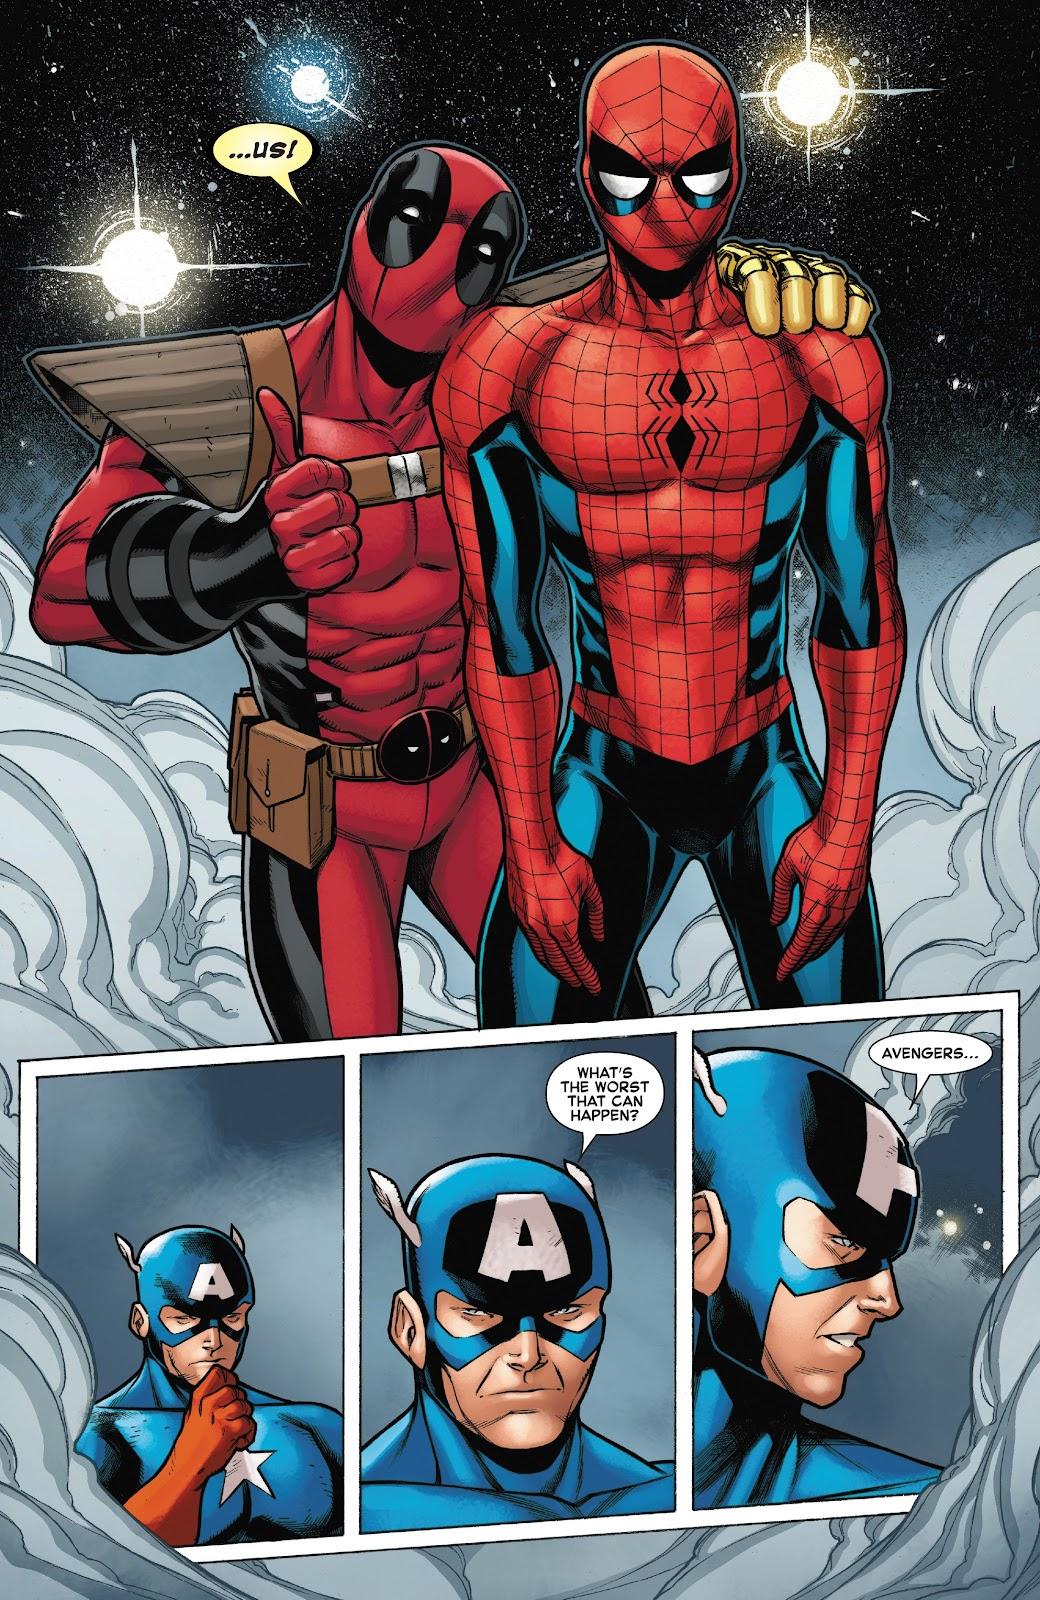 Read online Spider-Man/Deadpool comic -  Issue #49 - 16